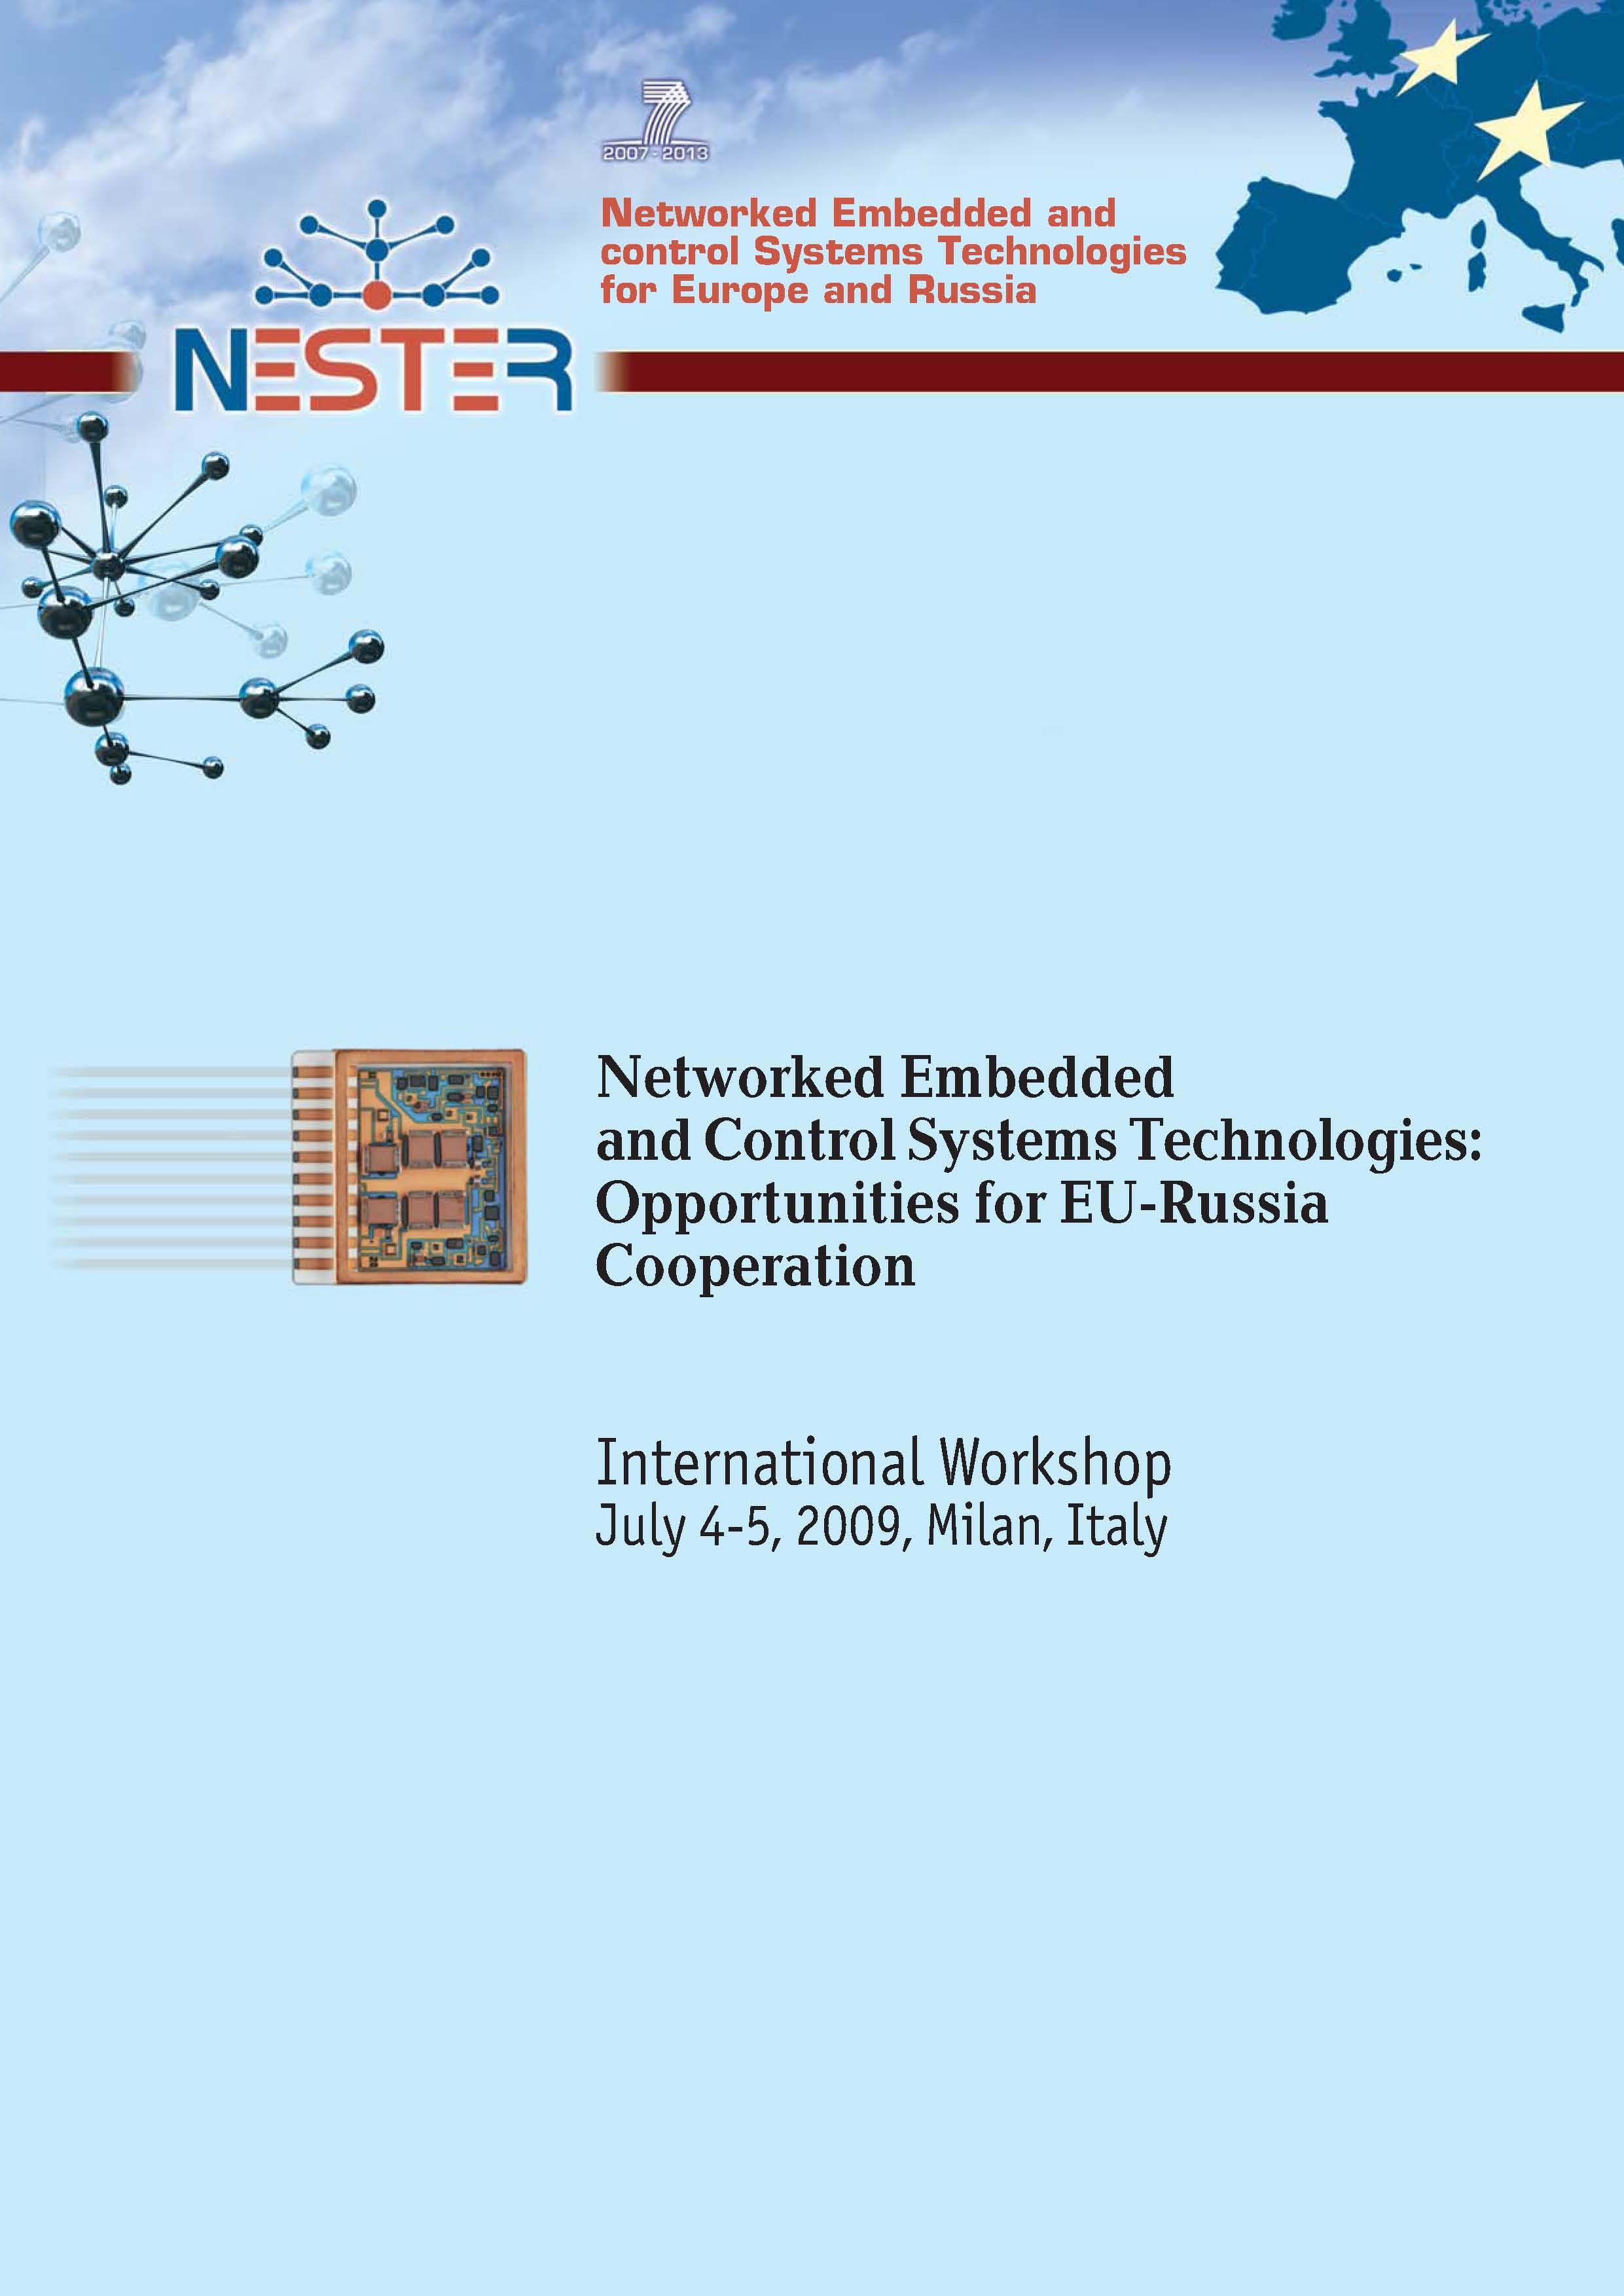 Universal wireless sensor networks technology platform and its applications